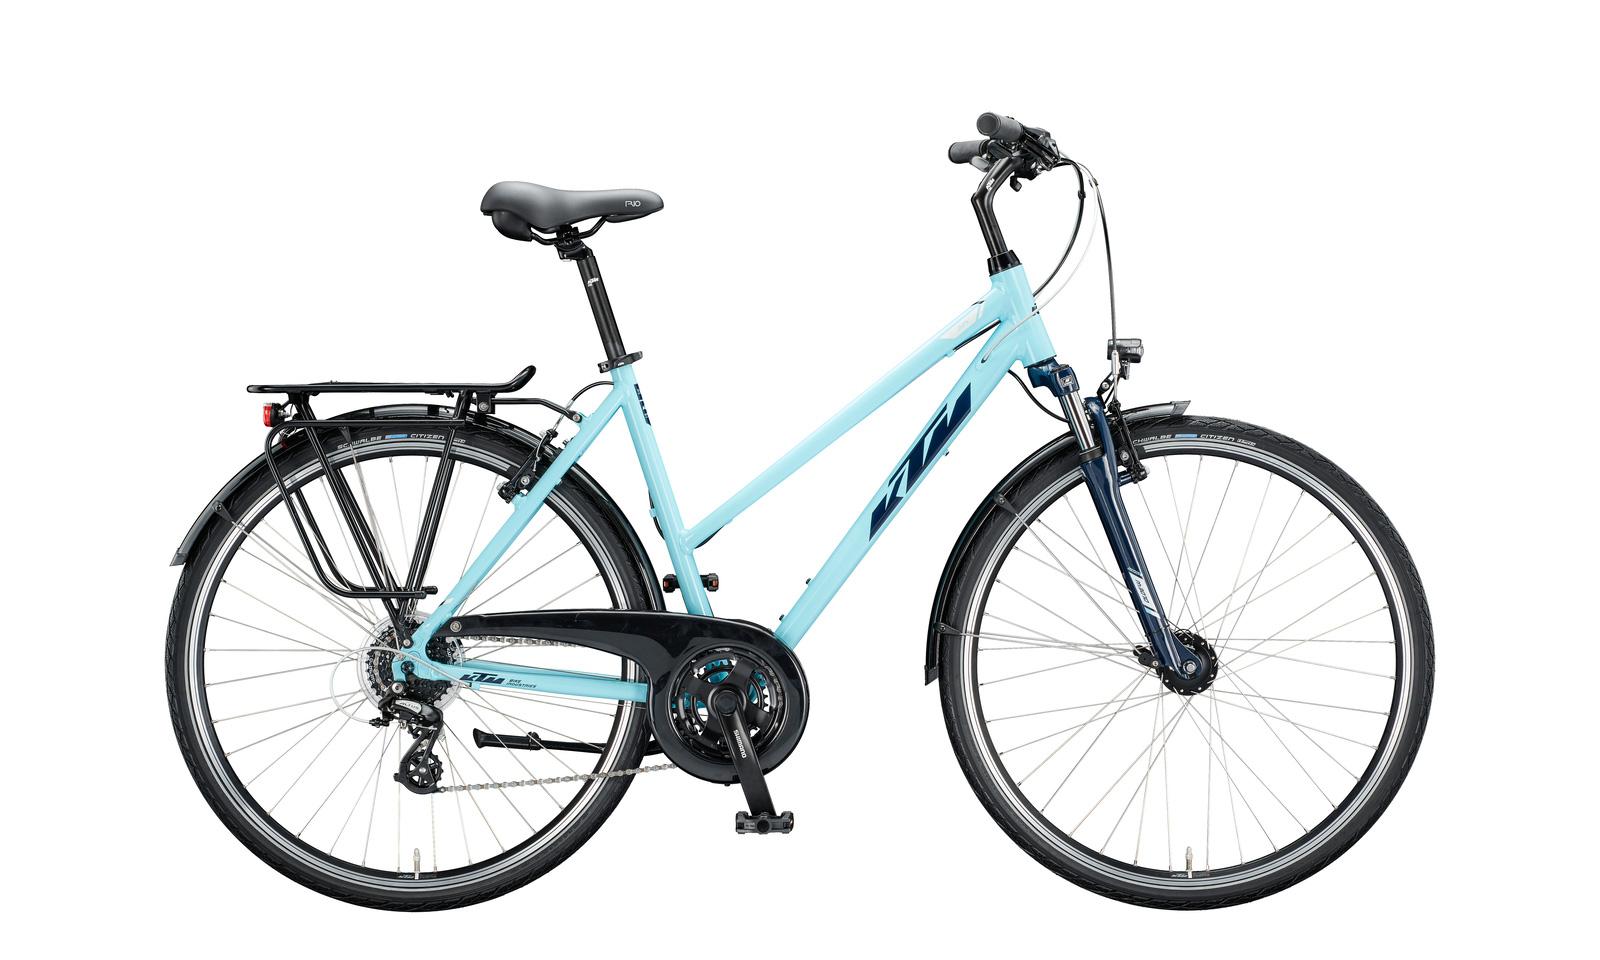 Biciclete KTM Trekking Onroad LIFE JOY 3x8 Shimano Altus